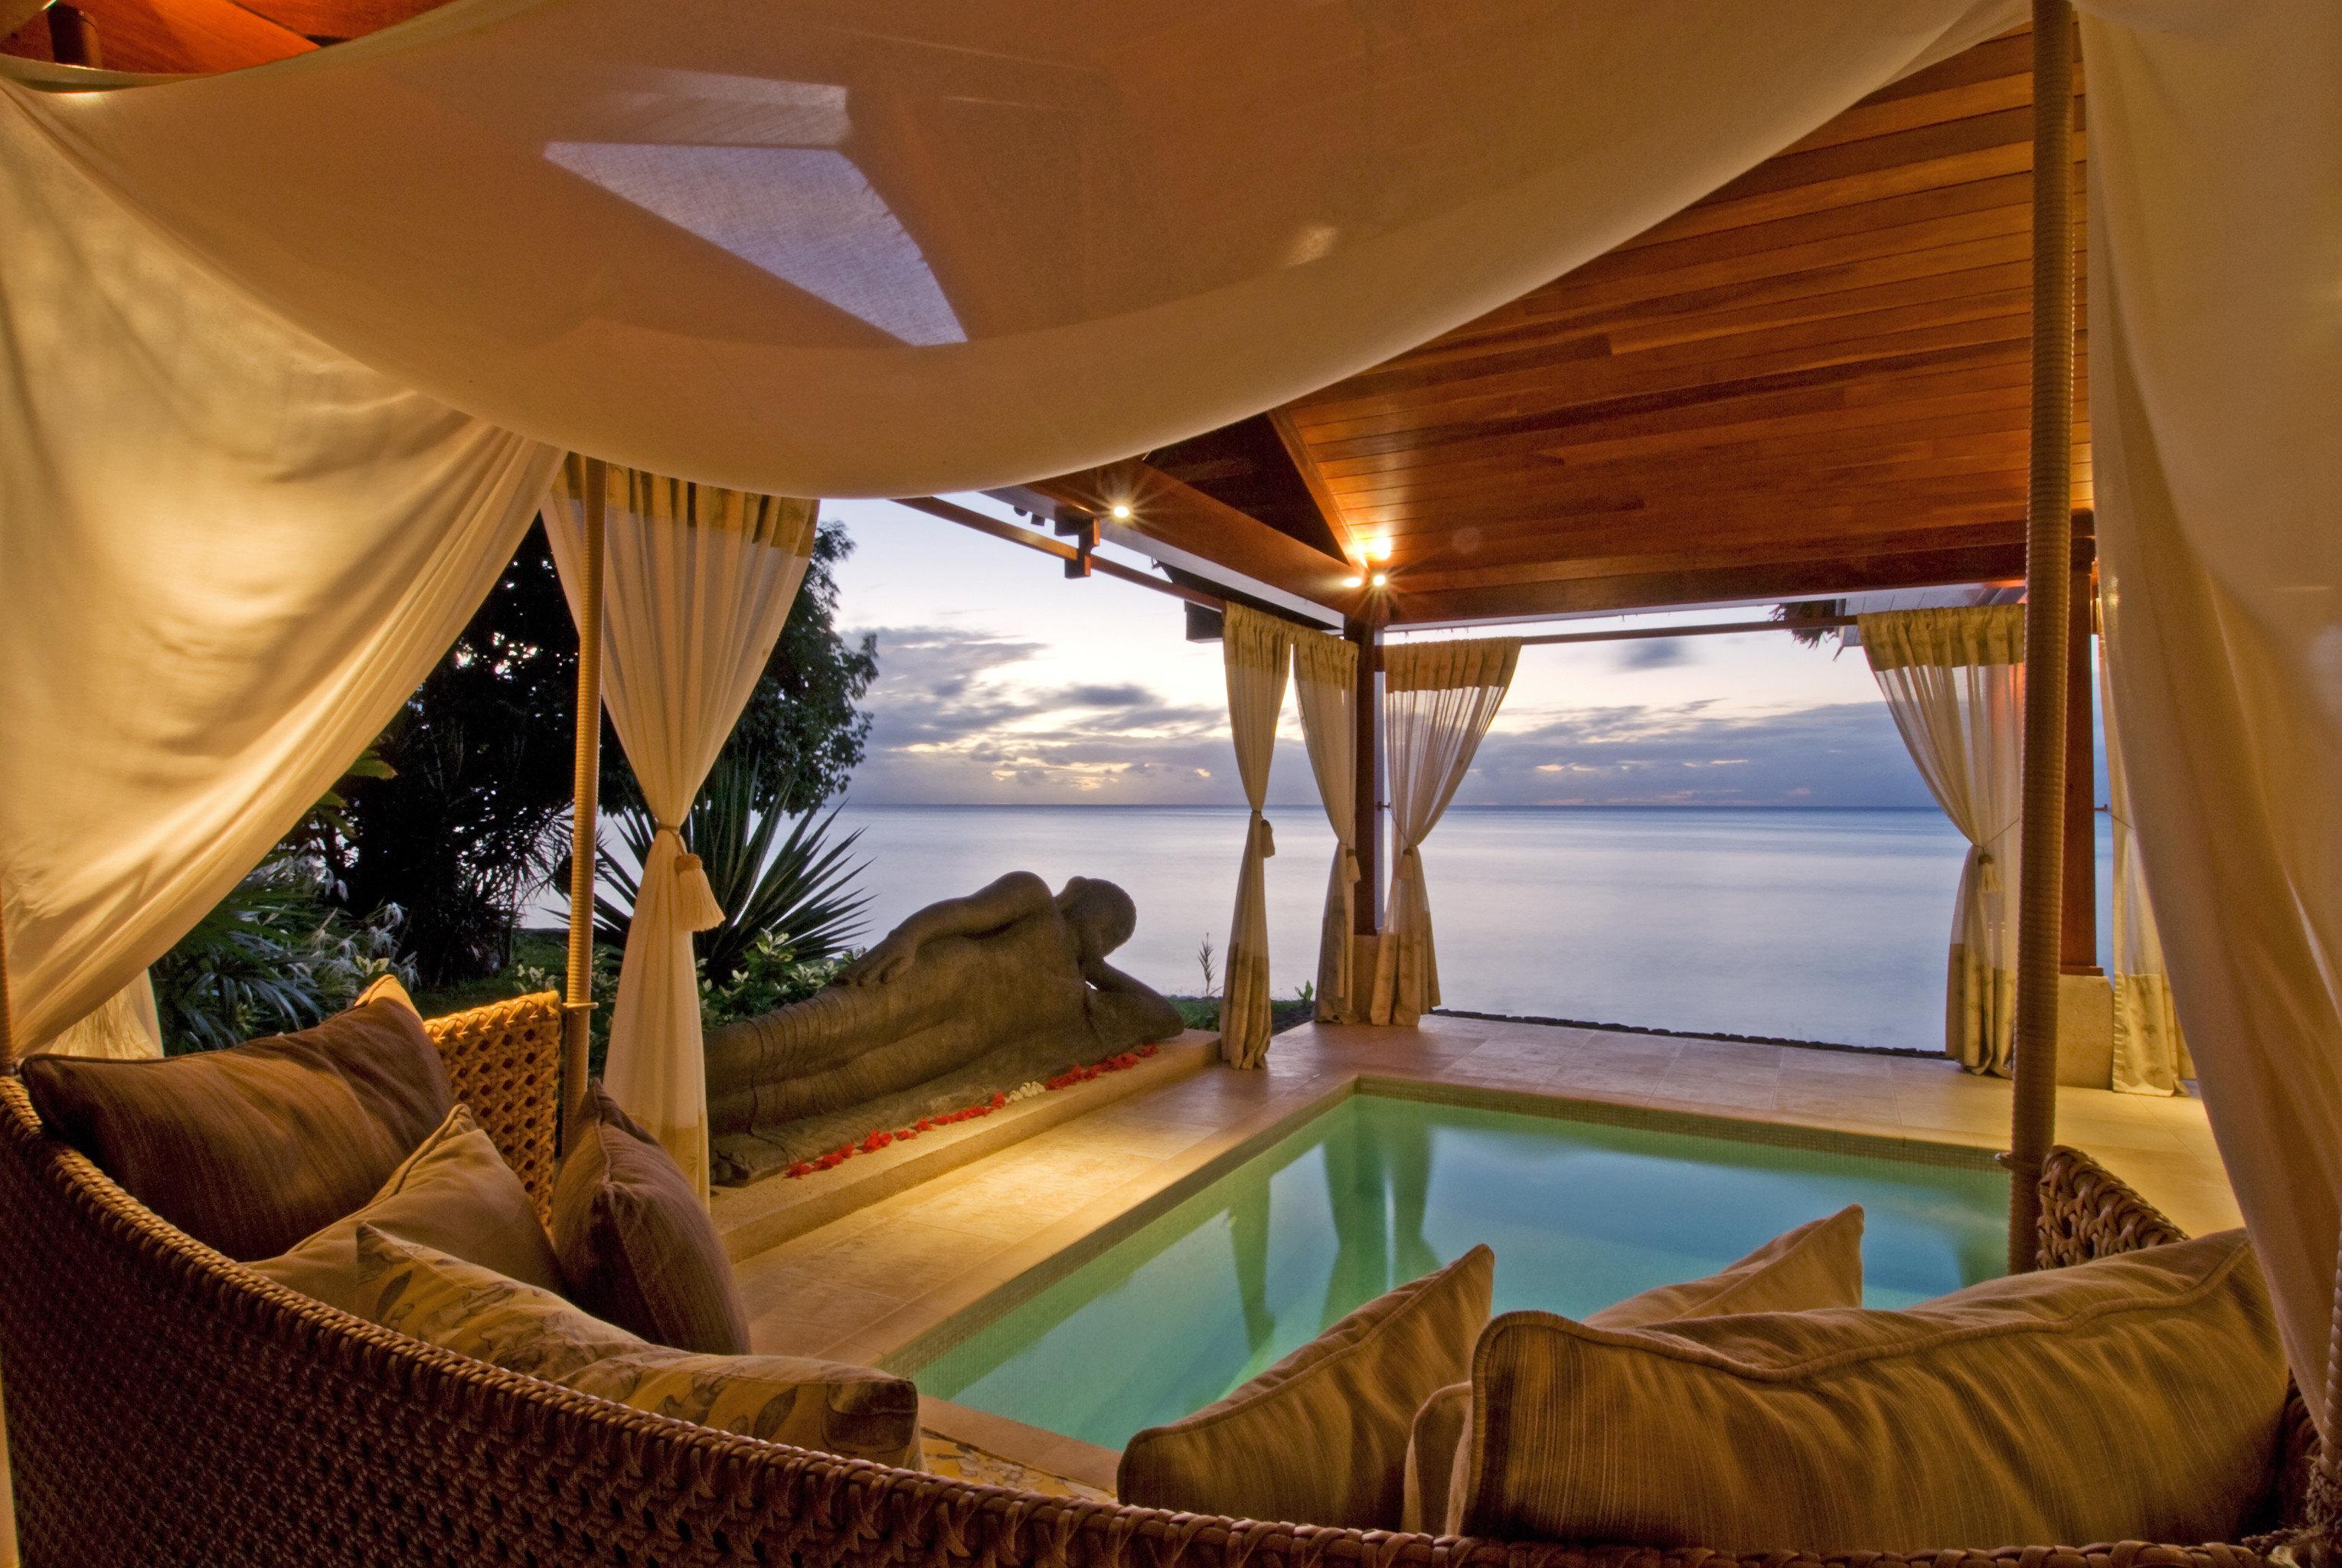 Beach Beachfront Honeymoon Luxury Romance leisure chair Resort swimming pool Villa Suite Bedroom